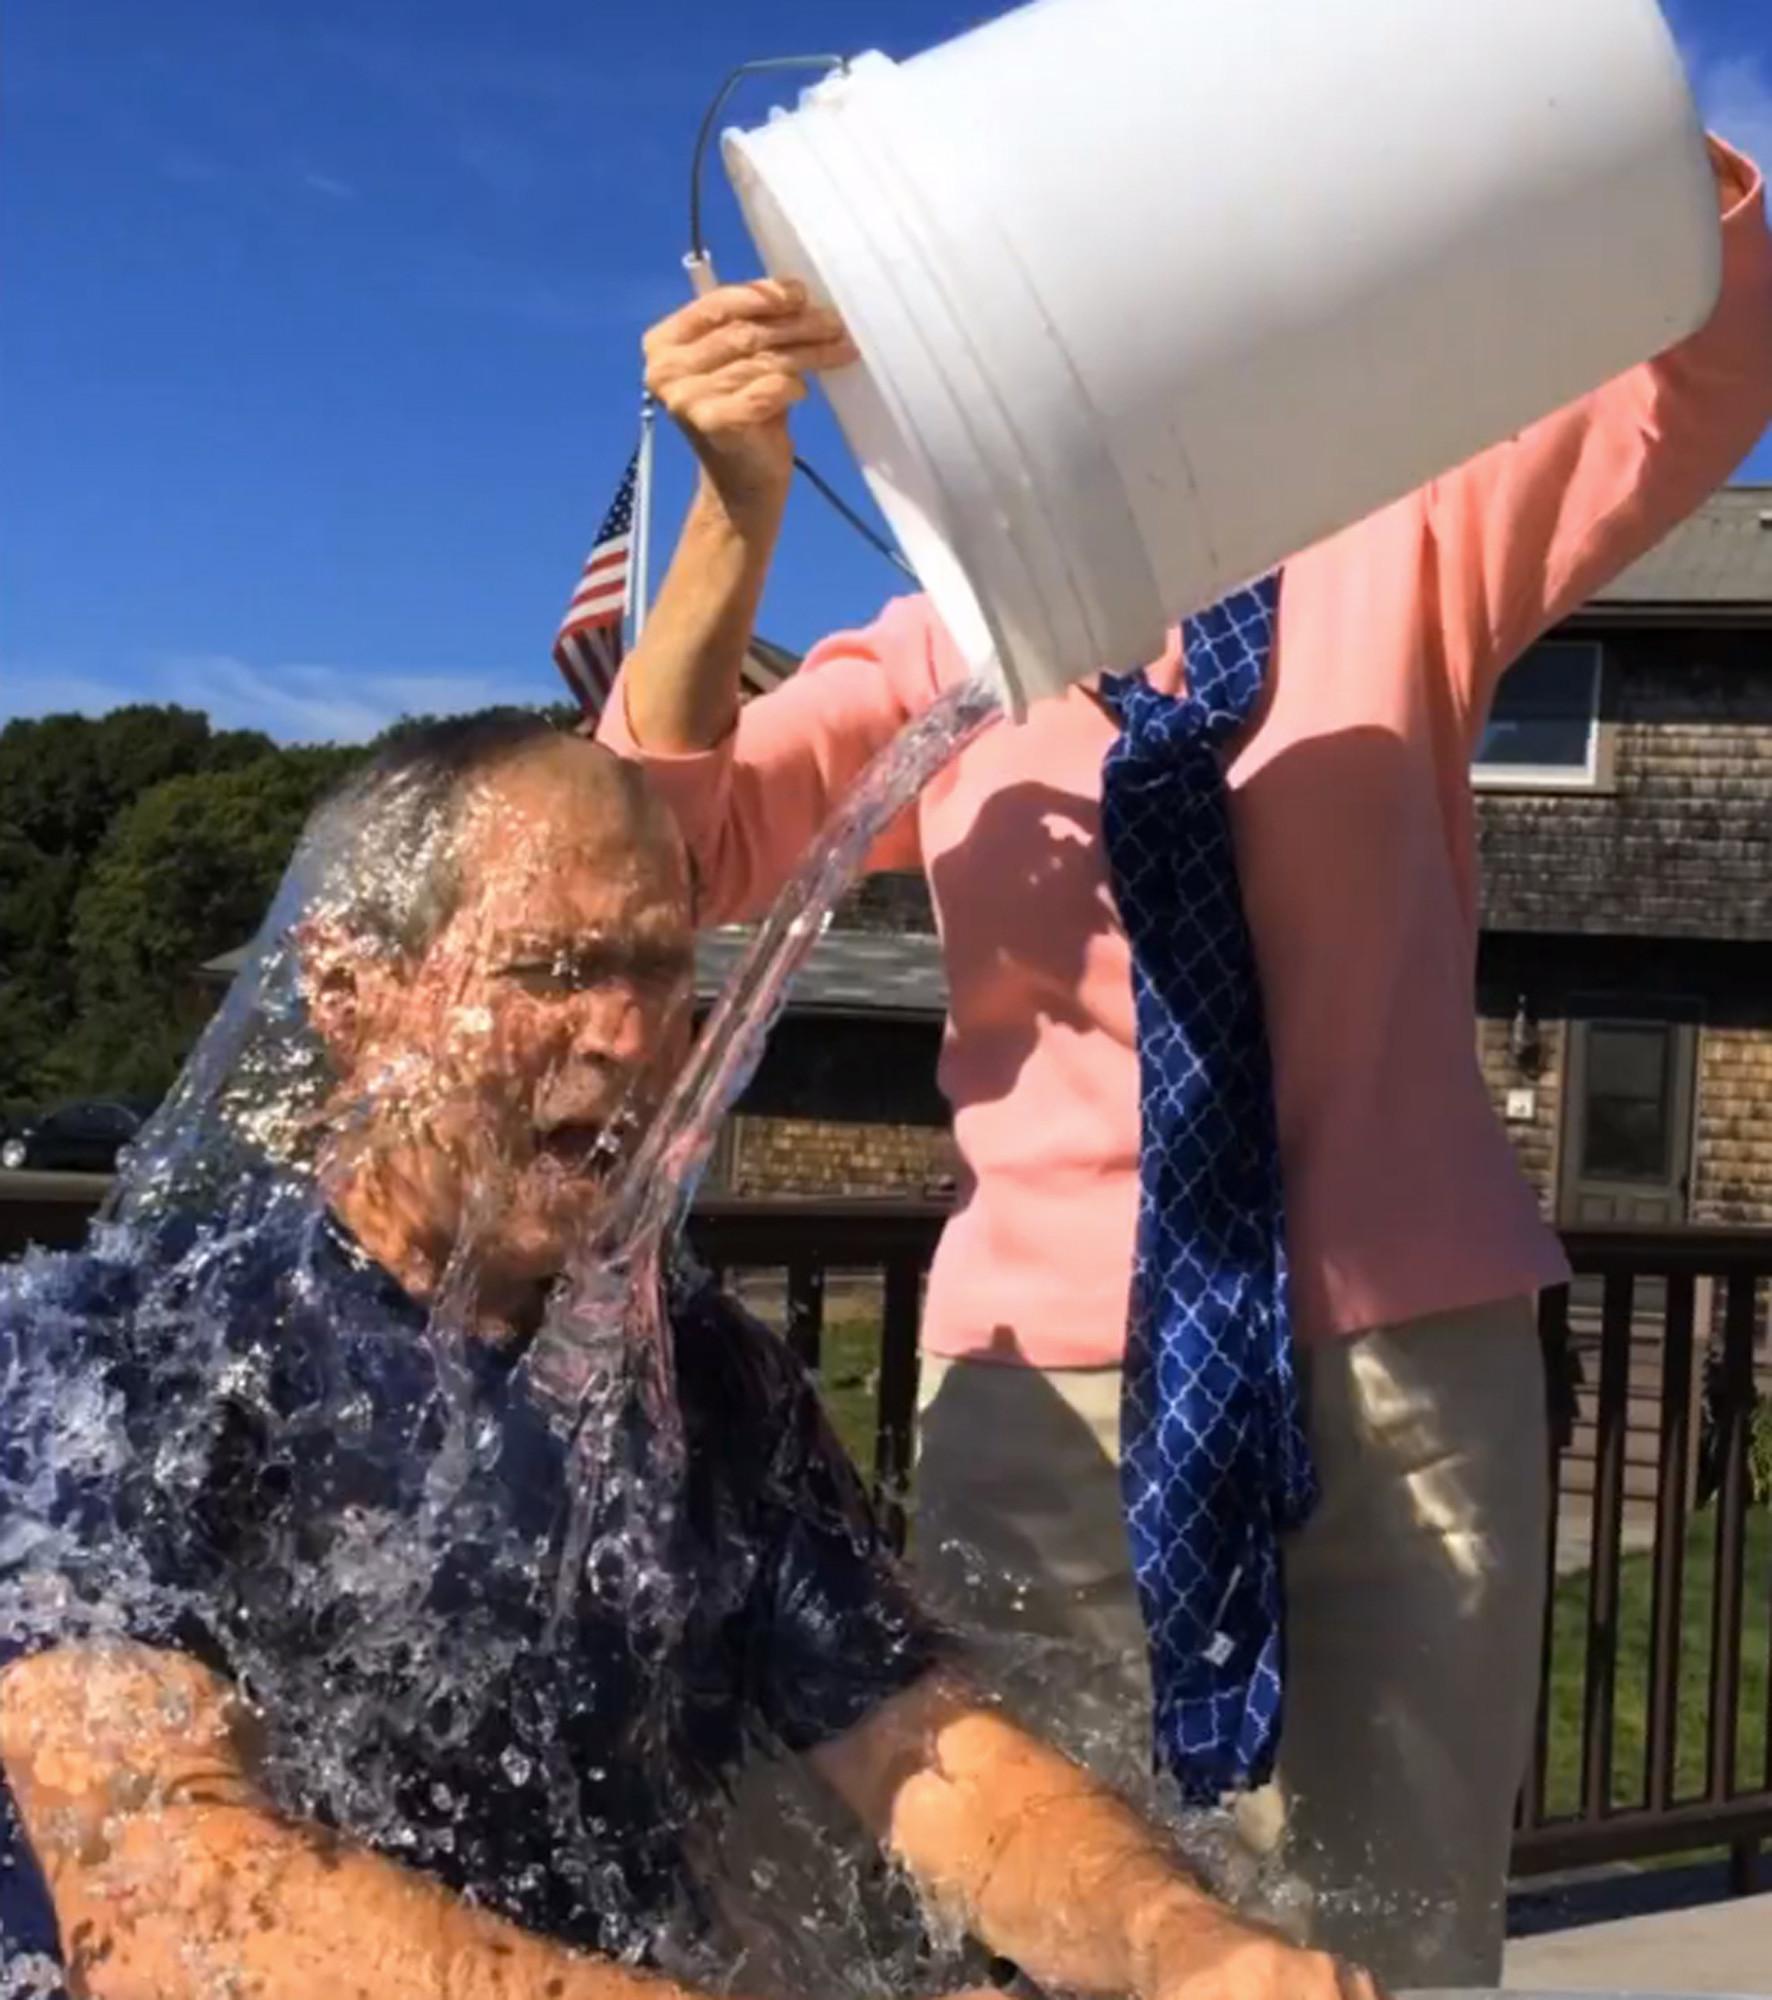 State Department throws wet blanket on Ice Bucket Challenge